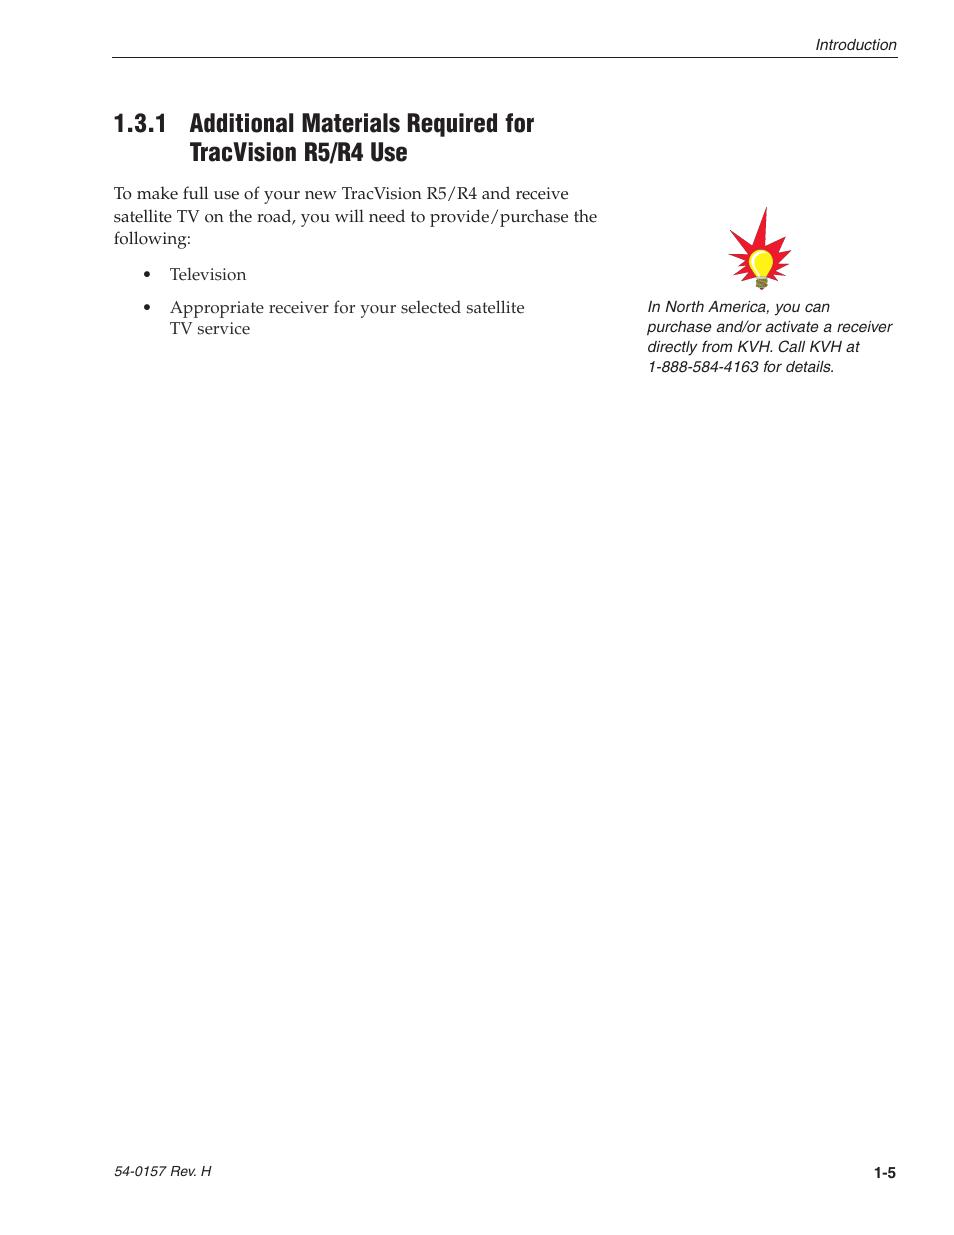 kvh industries tracvision r4 user manual page 11 65 original rh manualsdir com TracVision R5 KVH Upgrade